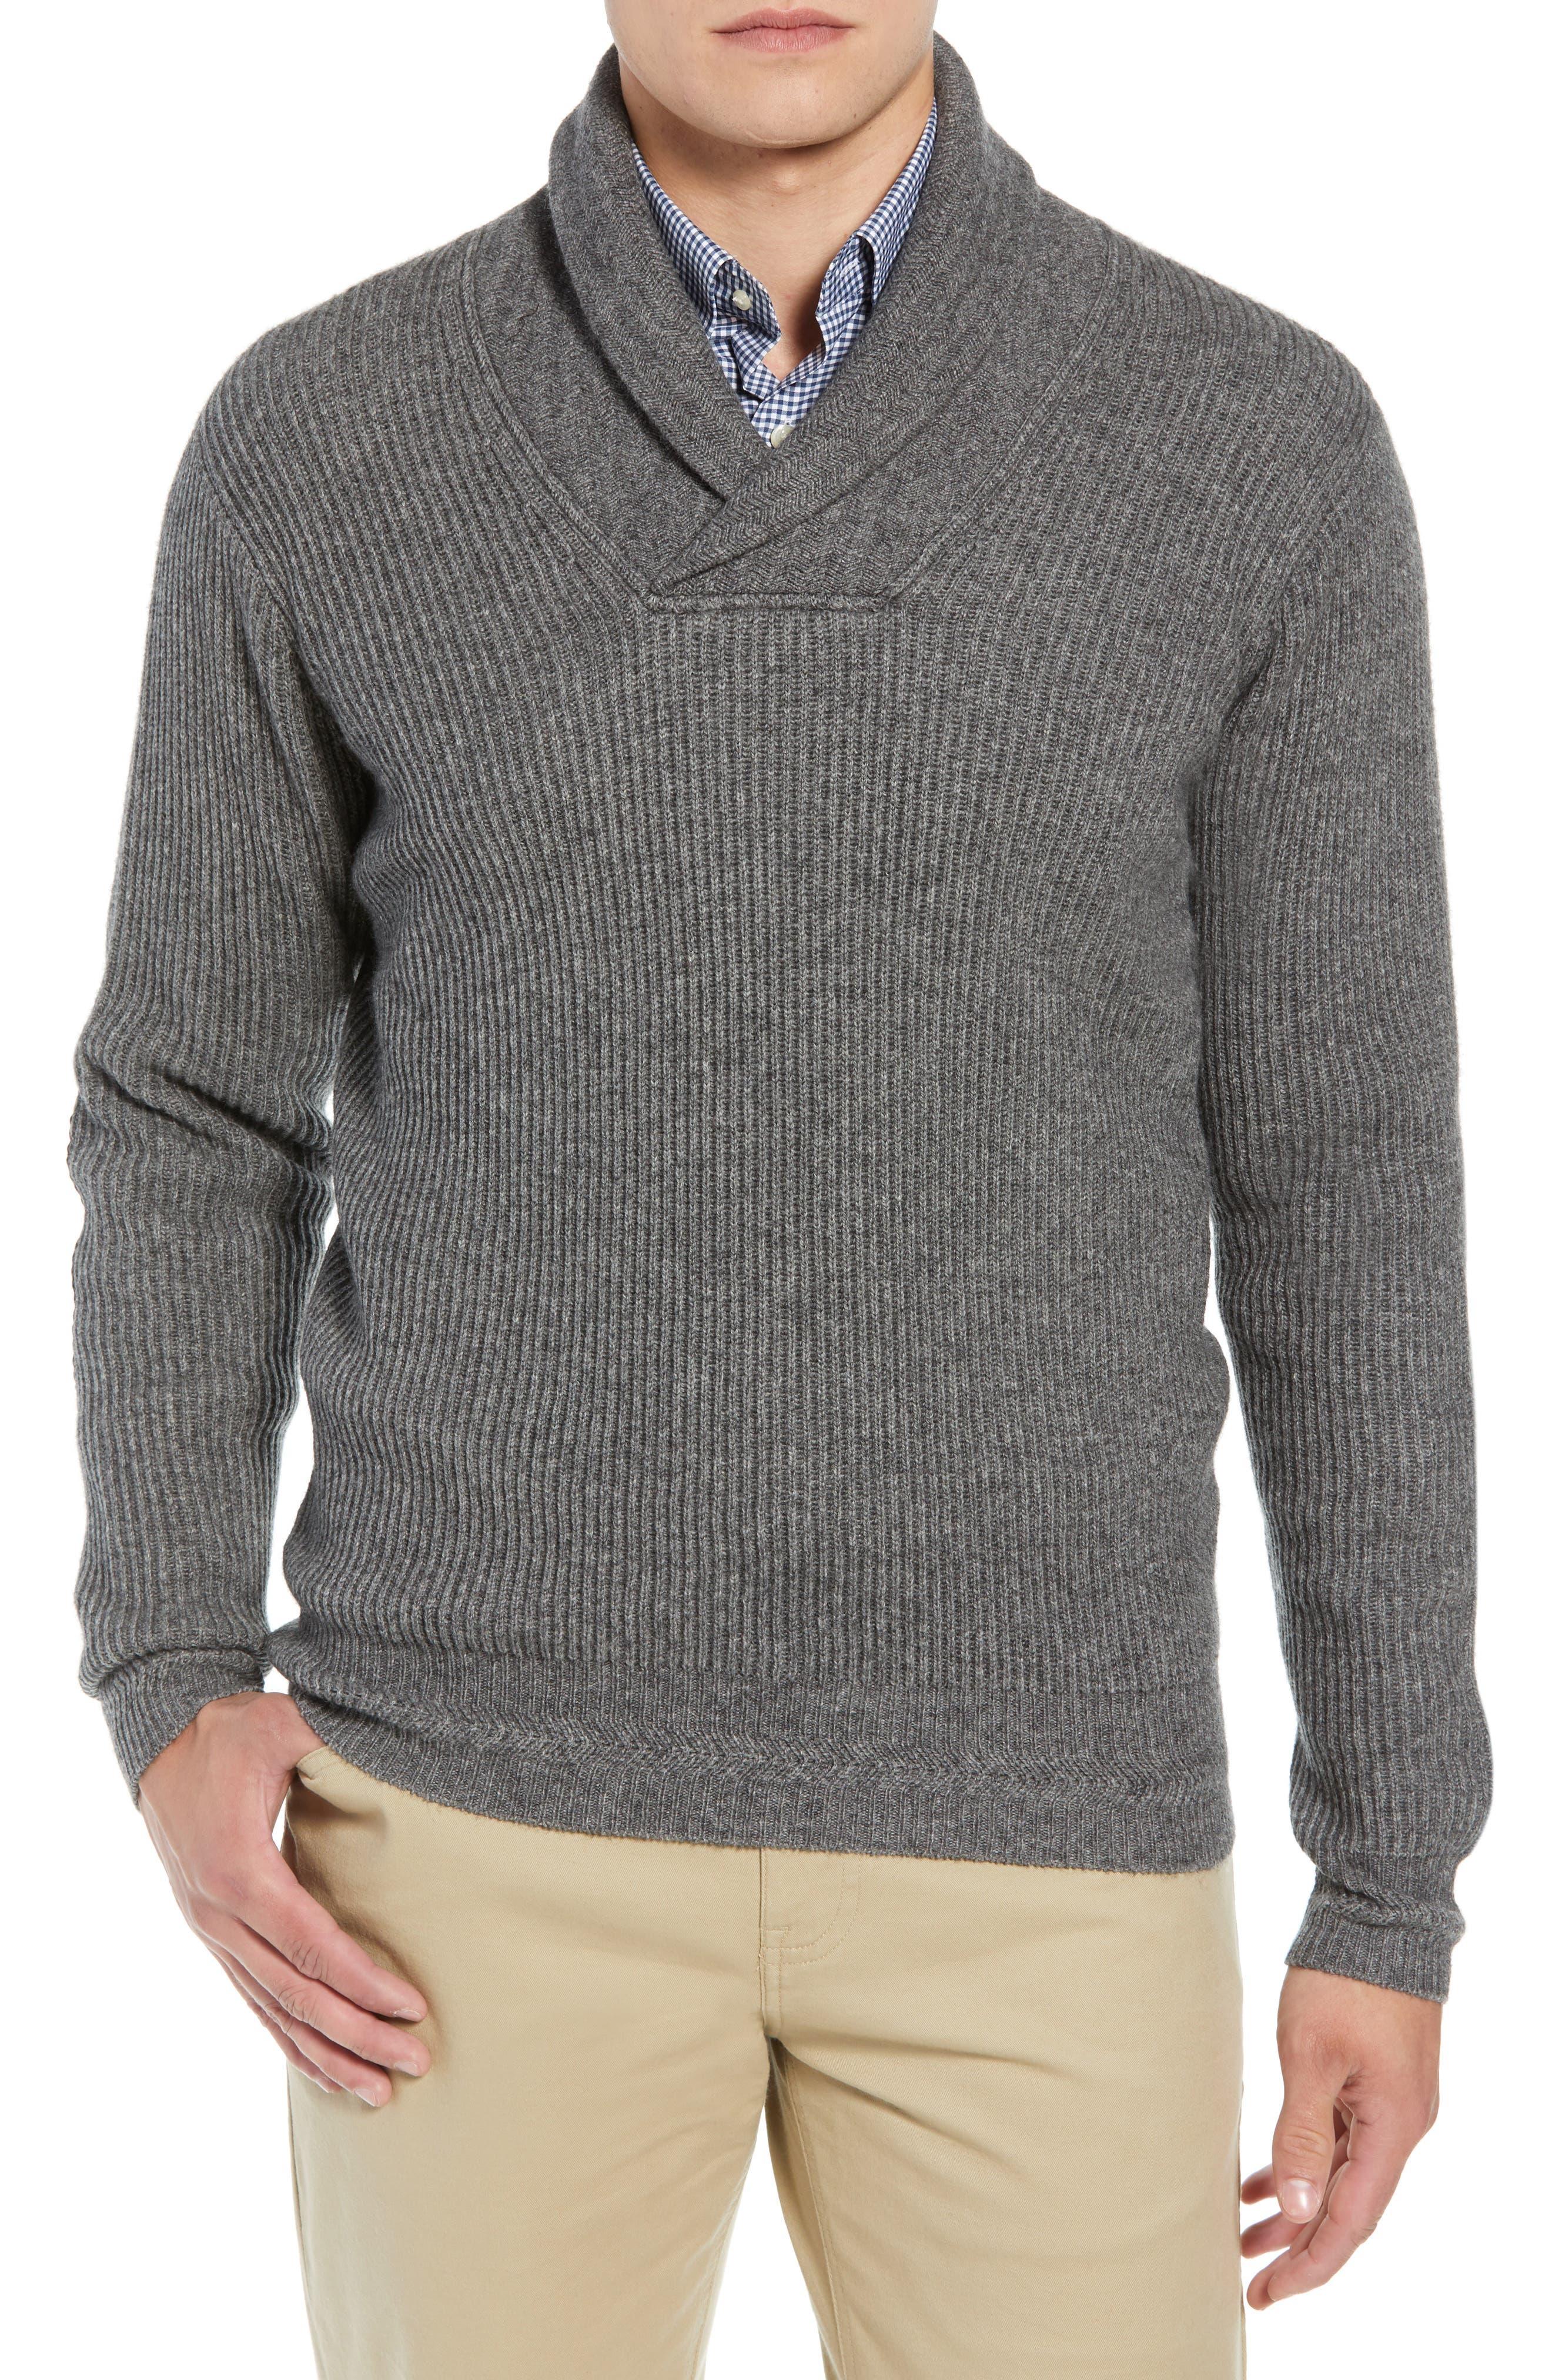 Mountainside Wool Blend Shawl Sweater,                             Main thumbnail 1, color,                             GREY